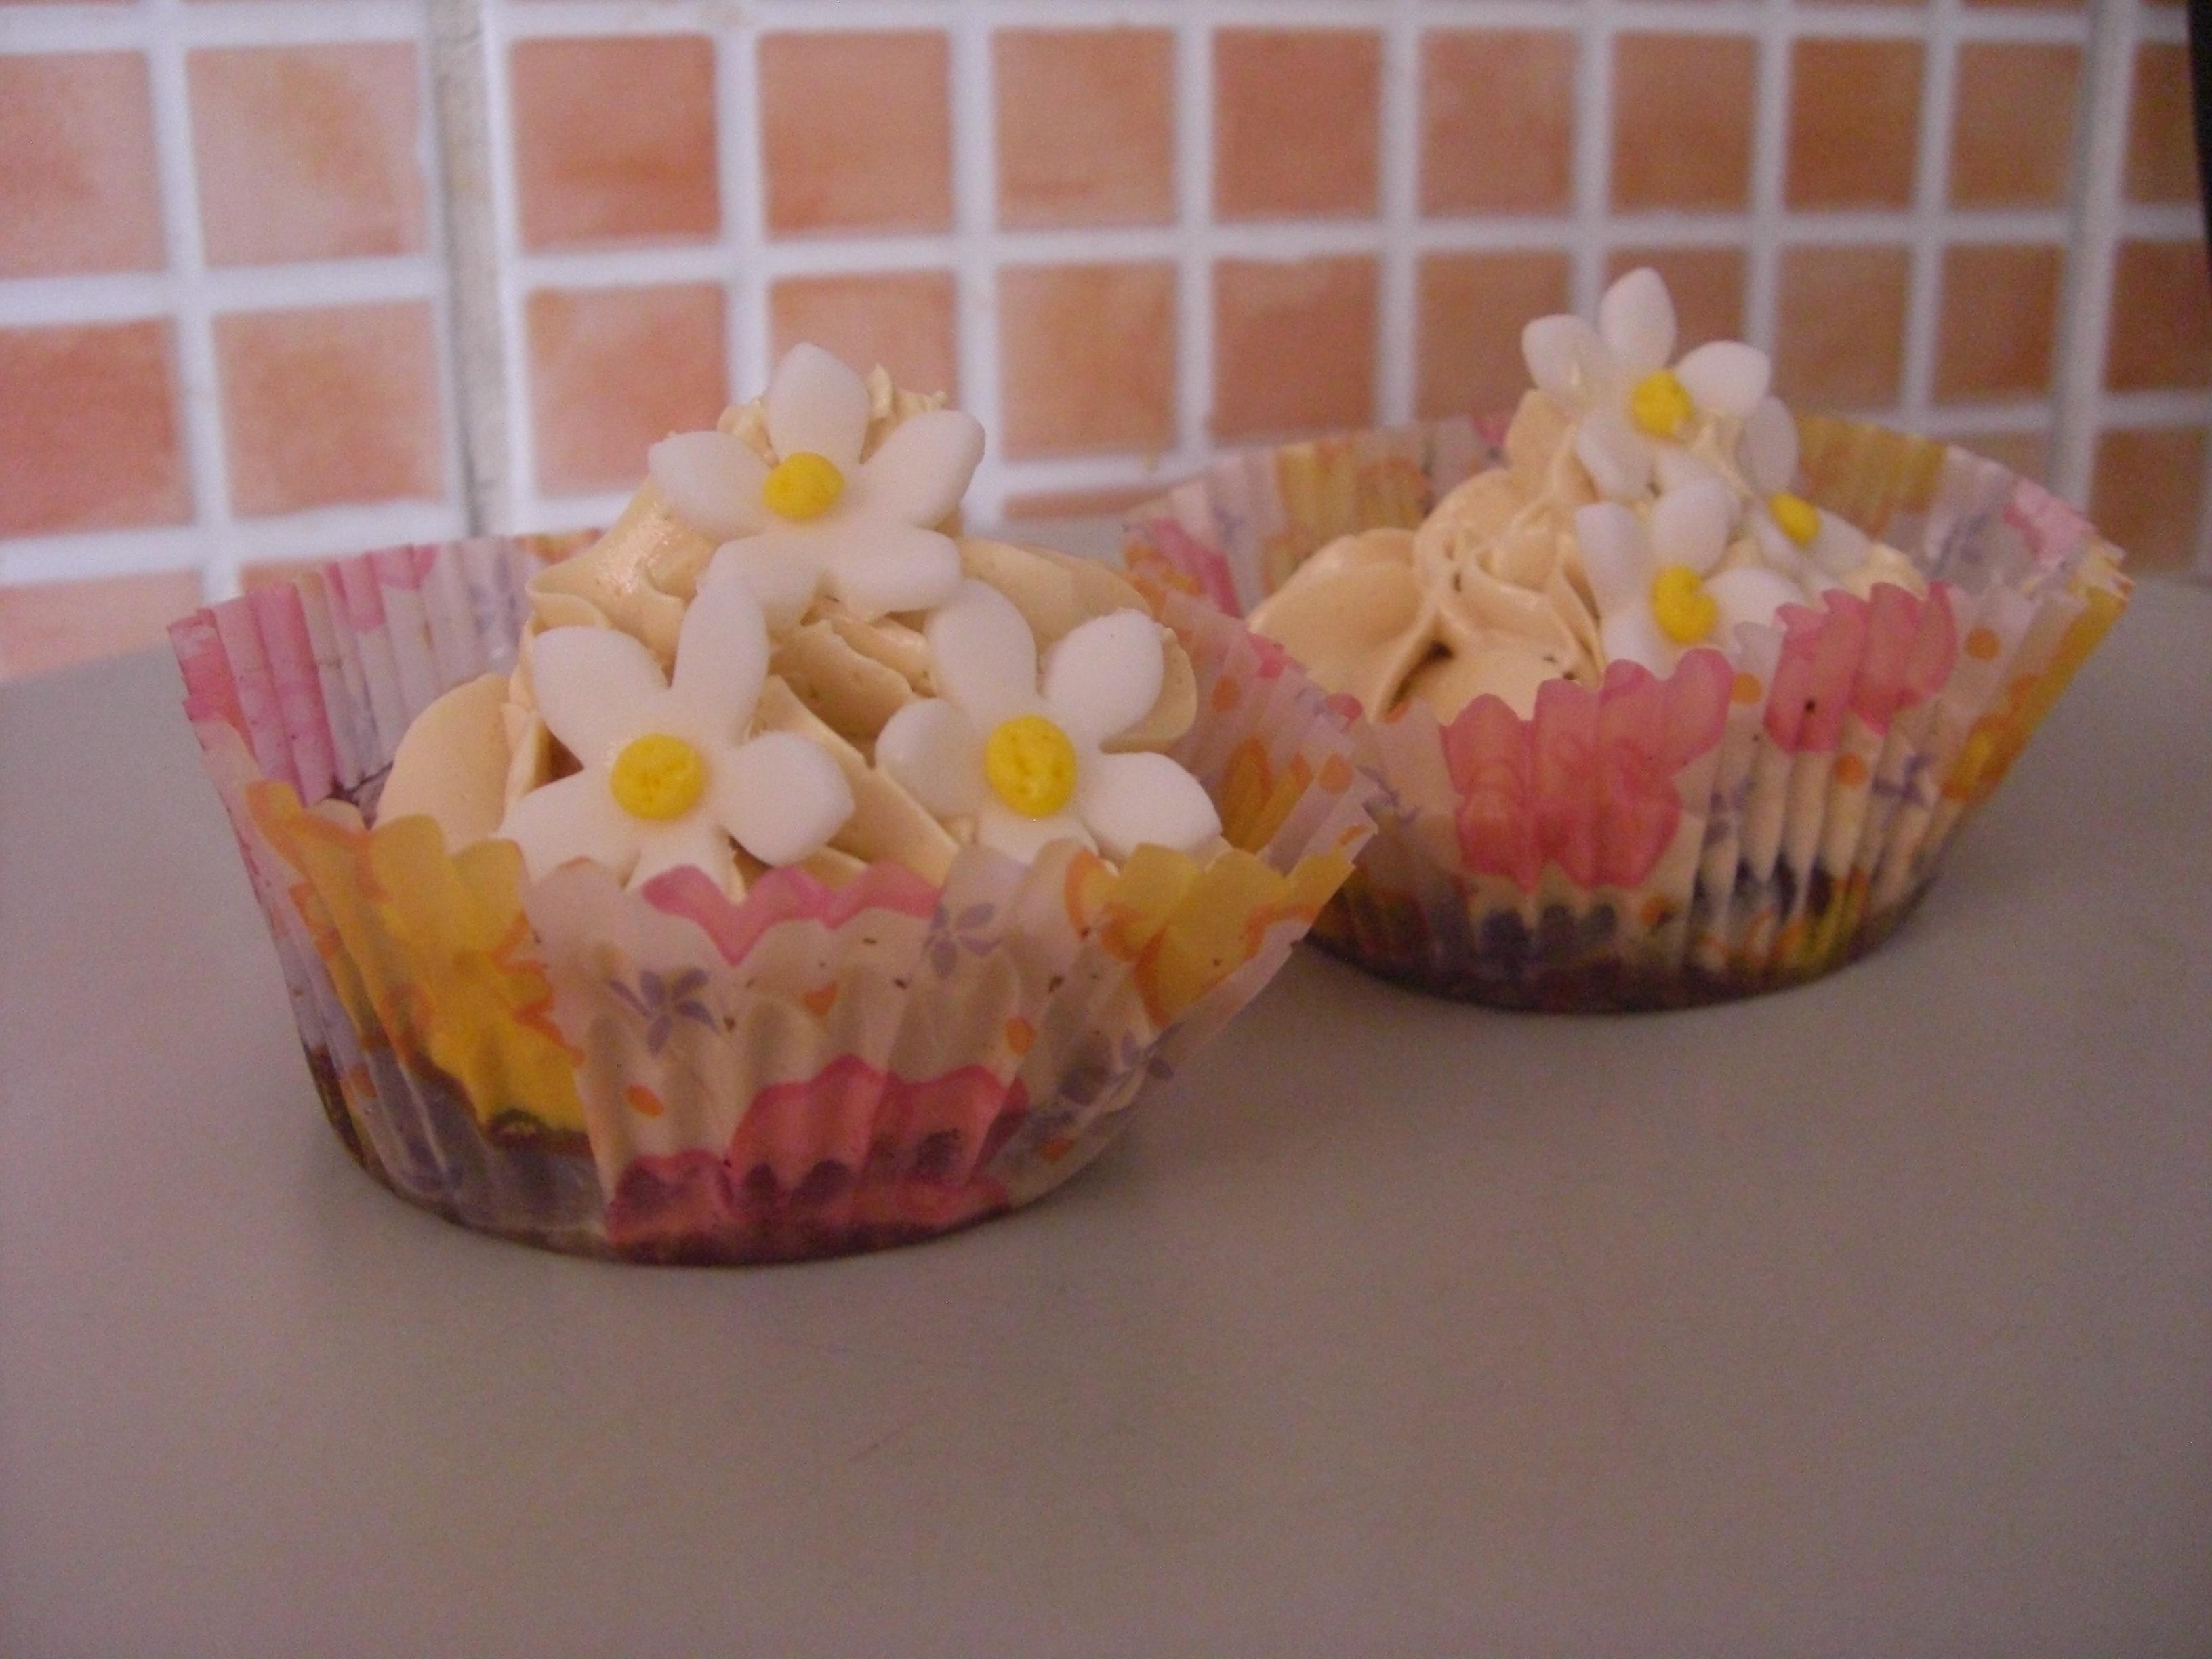 Cupcakes ala lchf